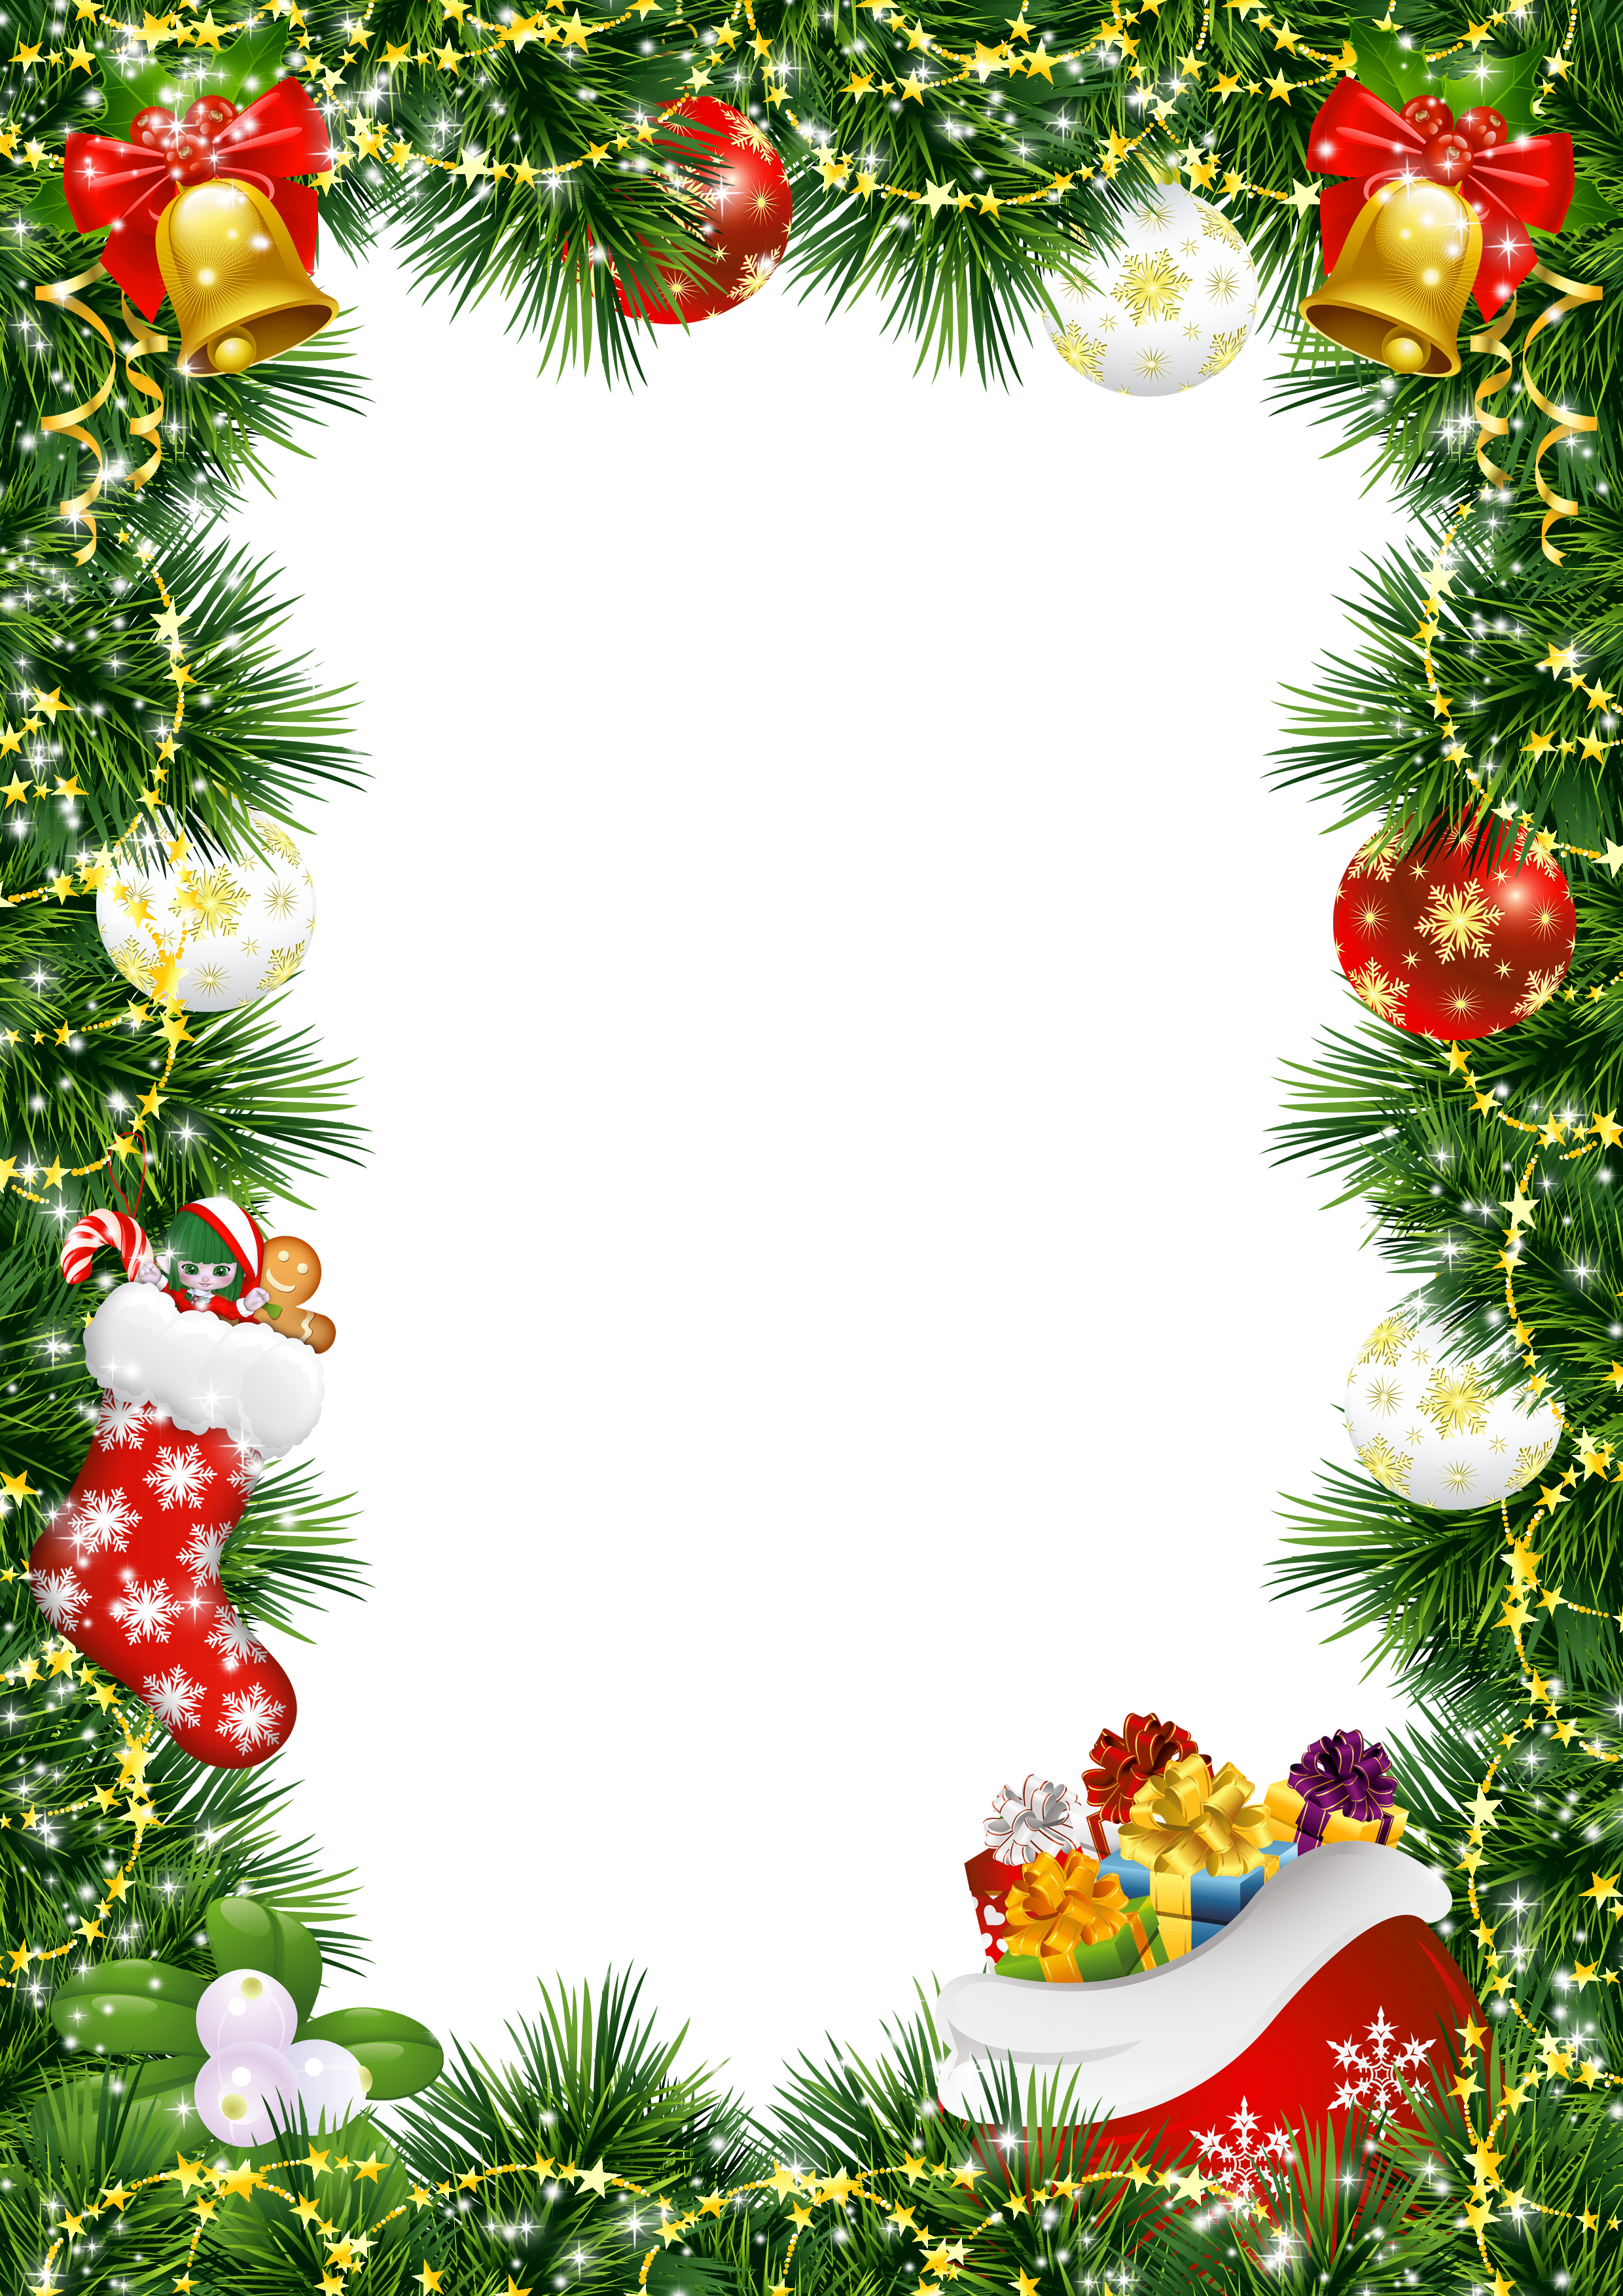 Christmas ornament frame - Christmas Photo Frame With Christmas Ornaments